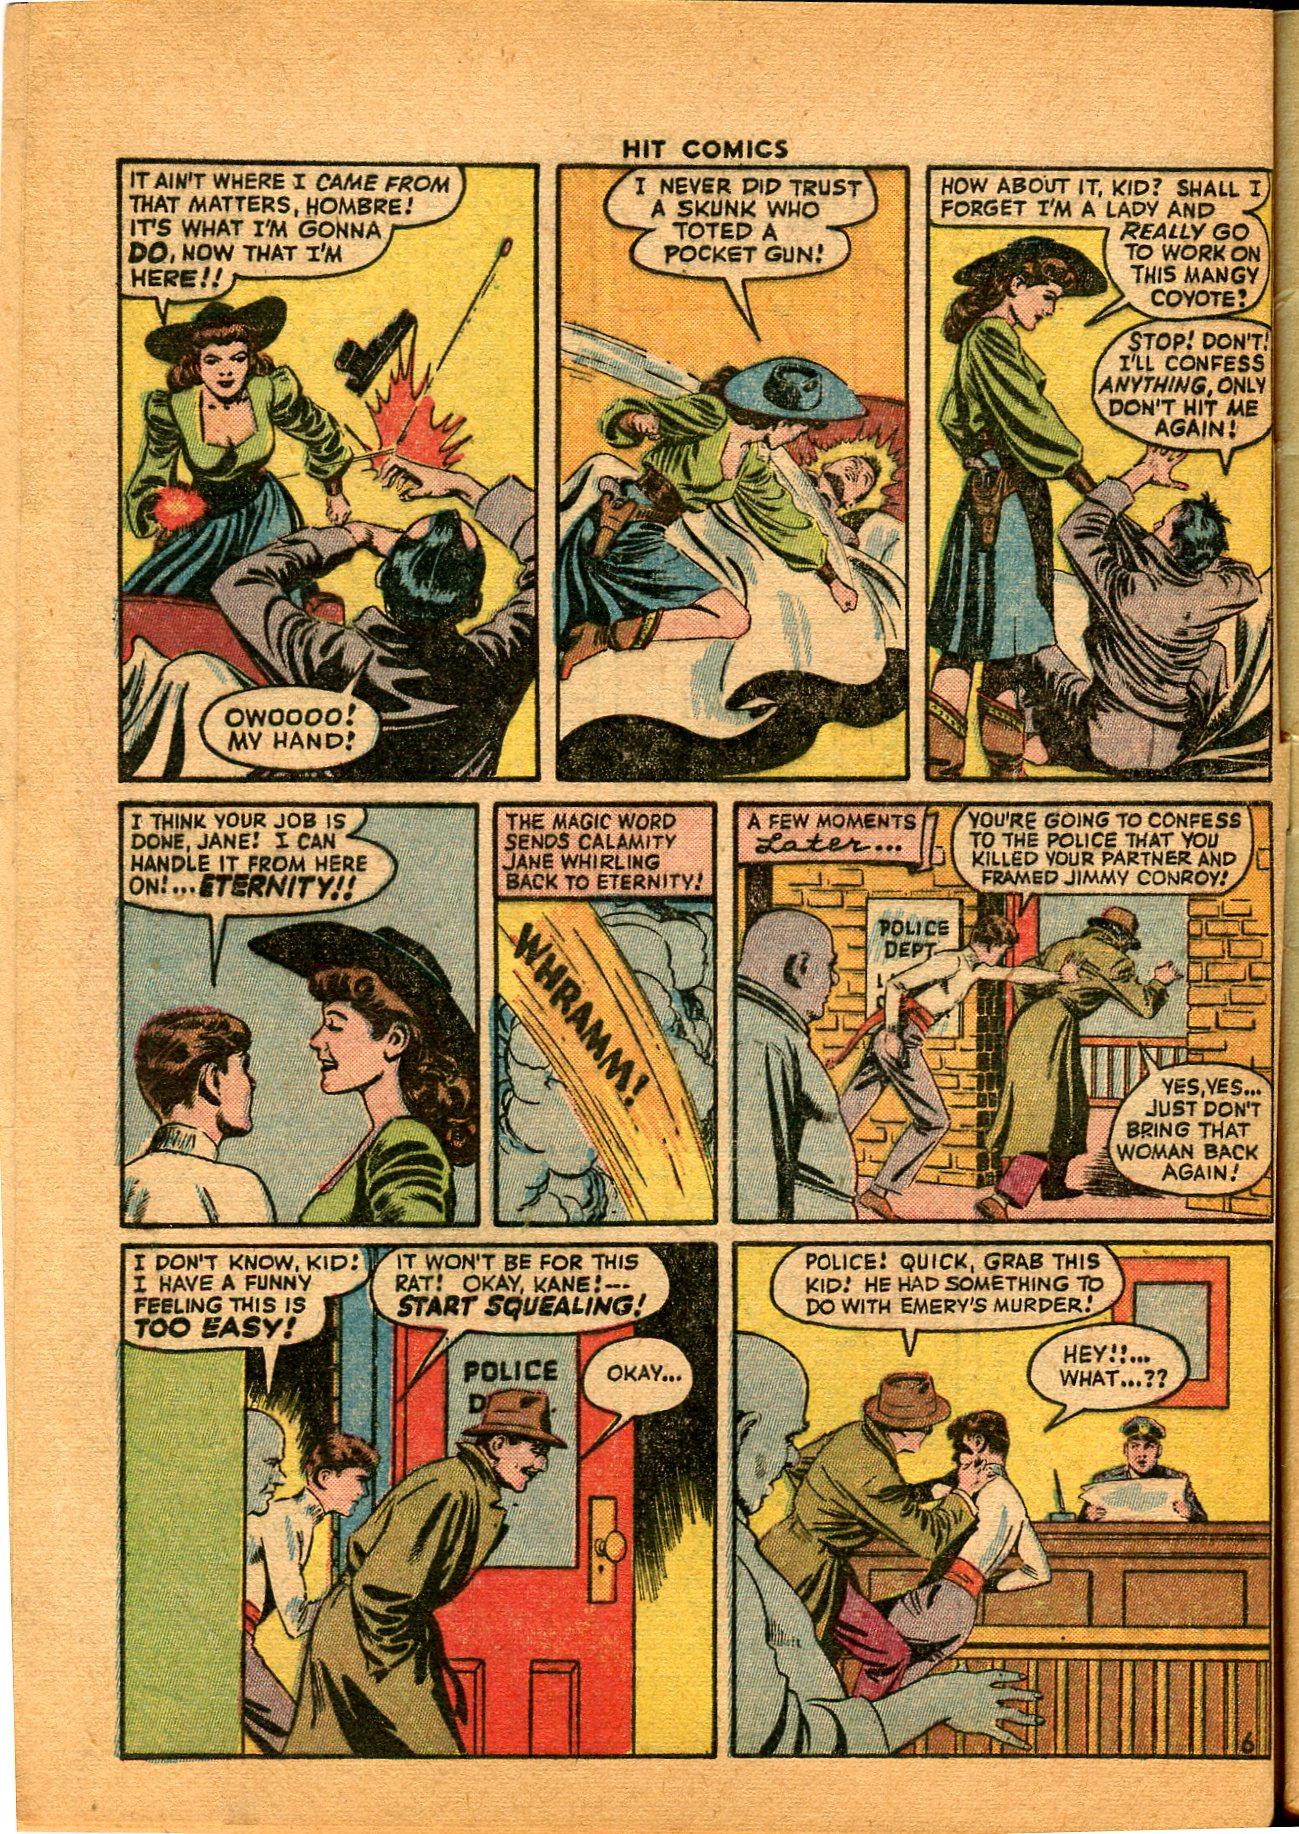 Read online Hit Comics comic -  Issue #35 - 8